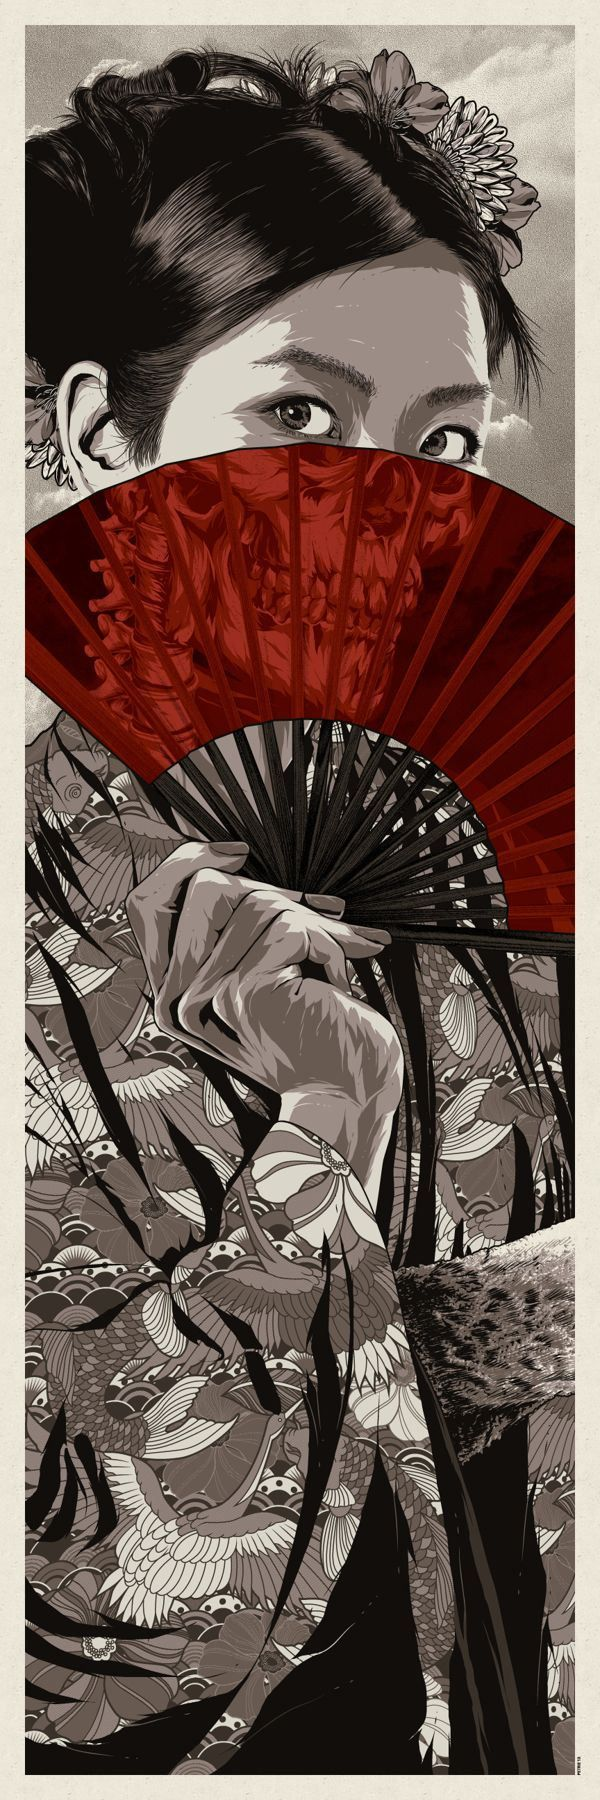 17 Top-tier illustration & drawing designs | Digital Illustration | Pinterest | Drawing Desi ...